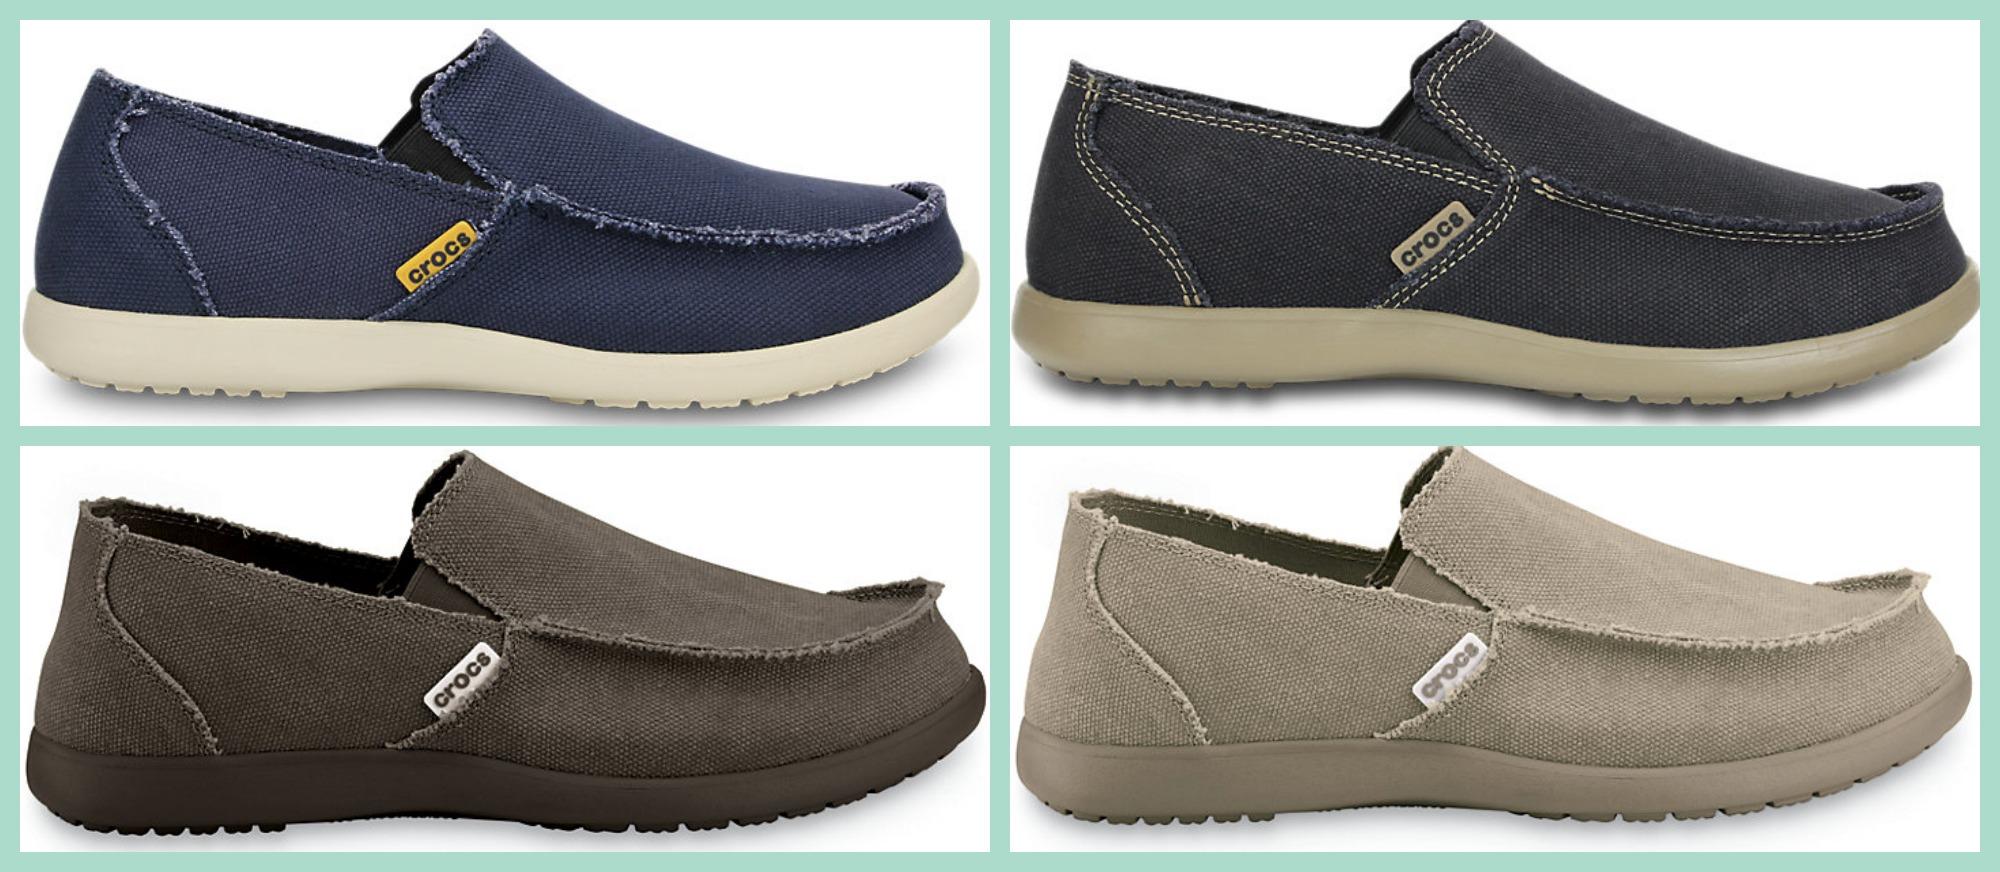 67e2414695c9b8 Crocs Santa Cruz Mens Loafers  19.99 Shipped (Regularly  54.99)